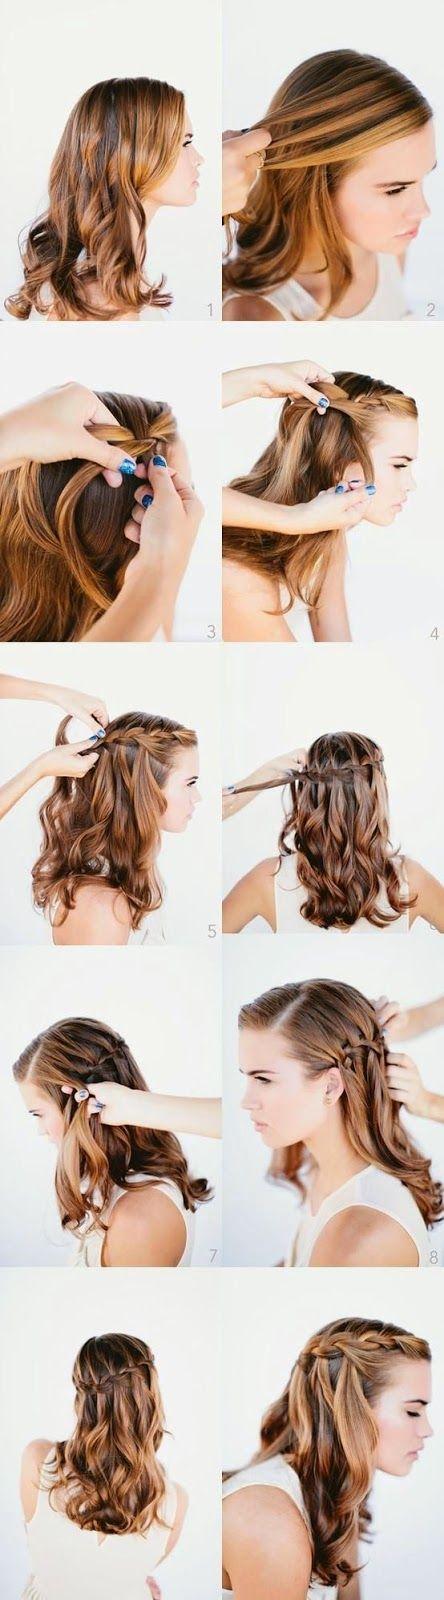 4 peinados Boho Chic para esta primavera   Cuidar de tu belleza es facilisimo.com